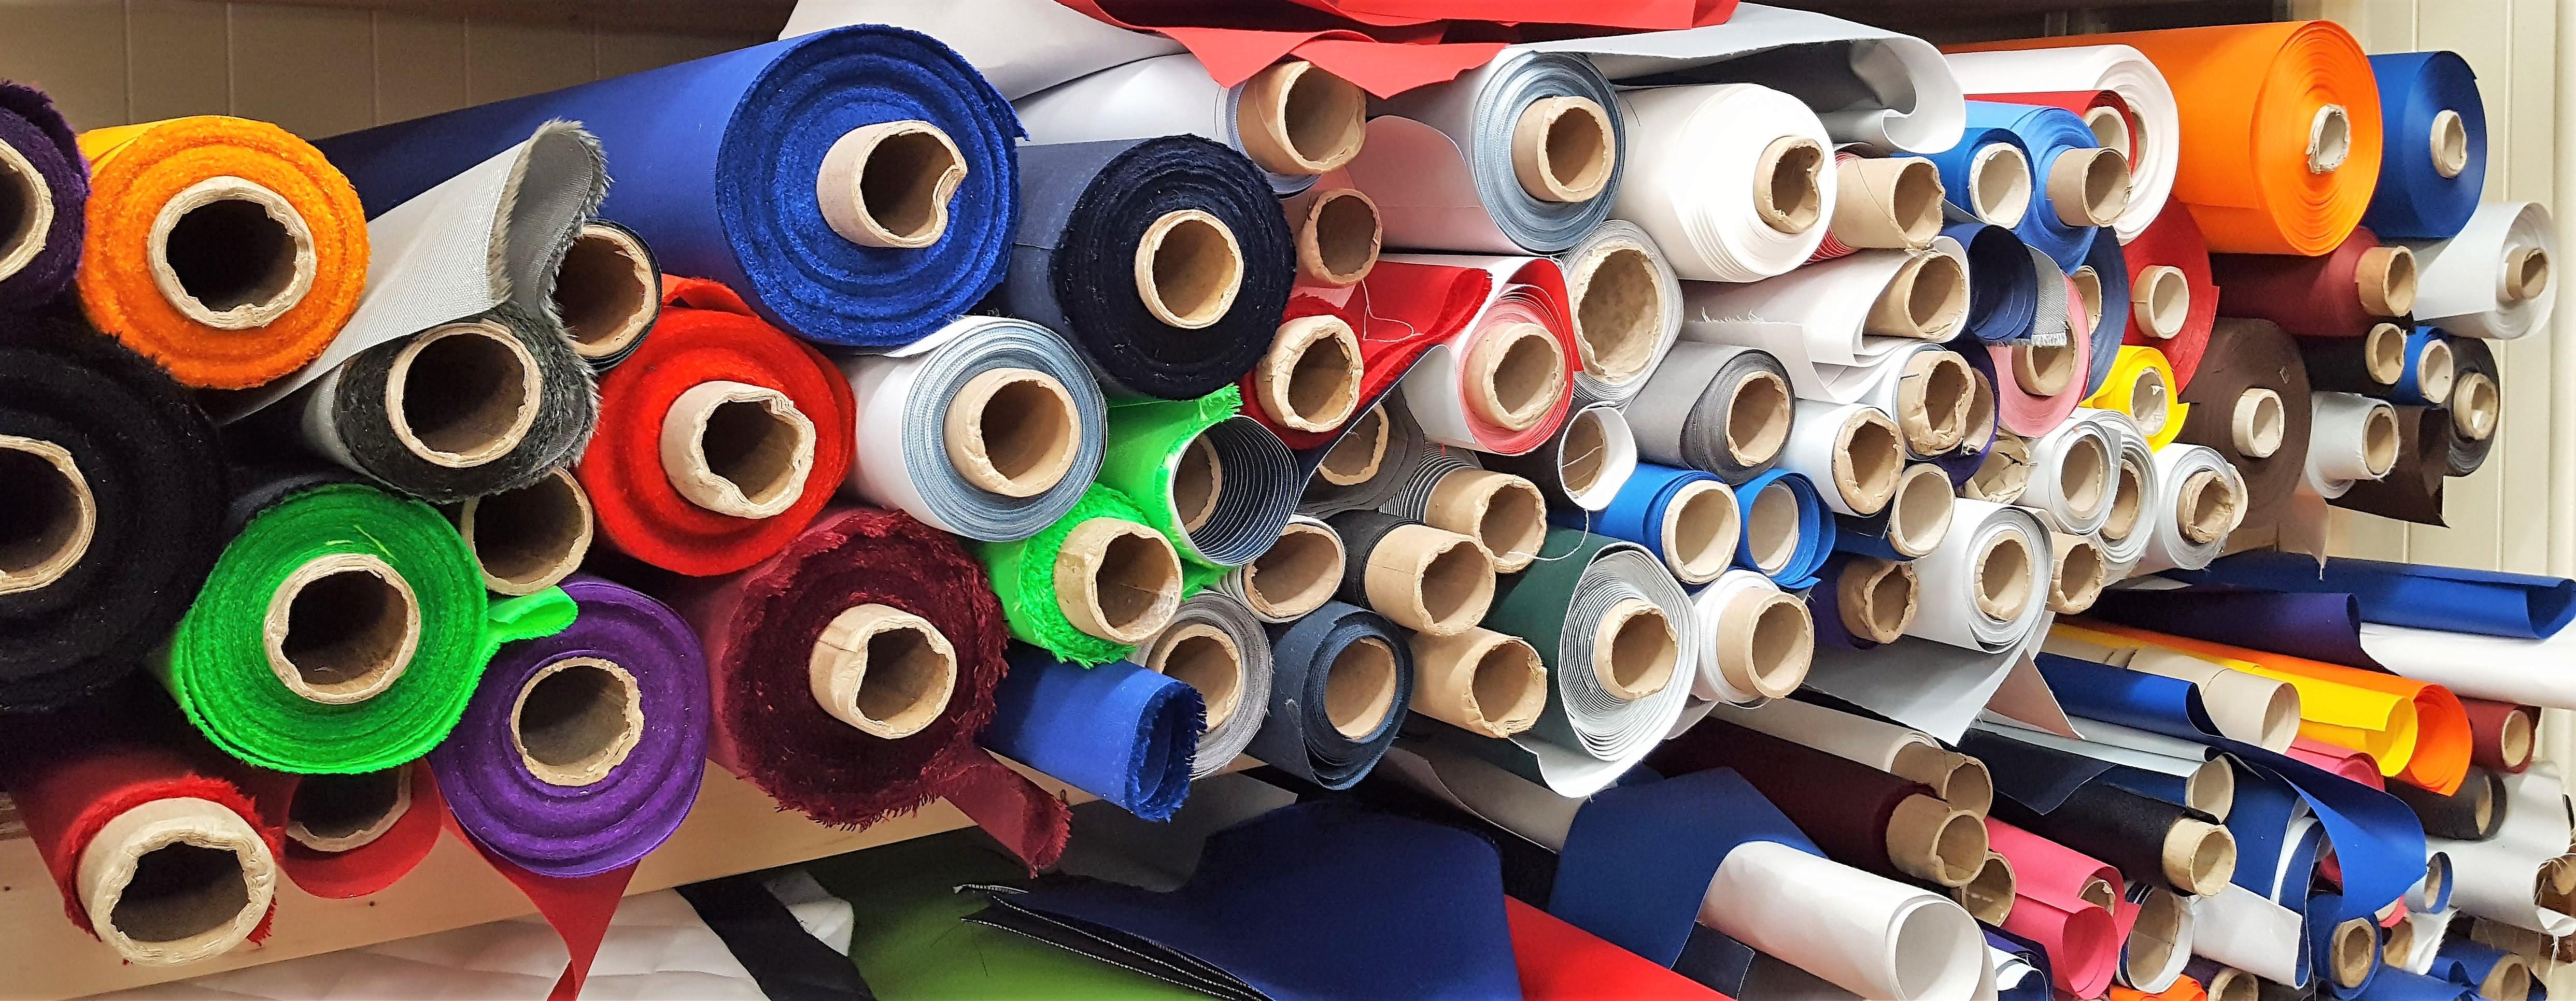 bbs-fabrics.jpg